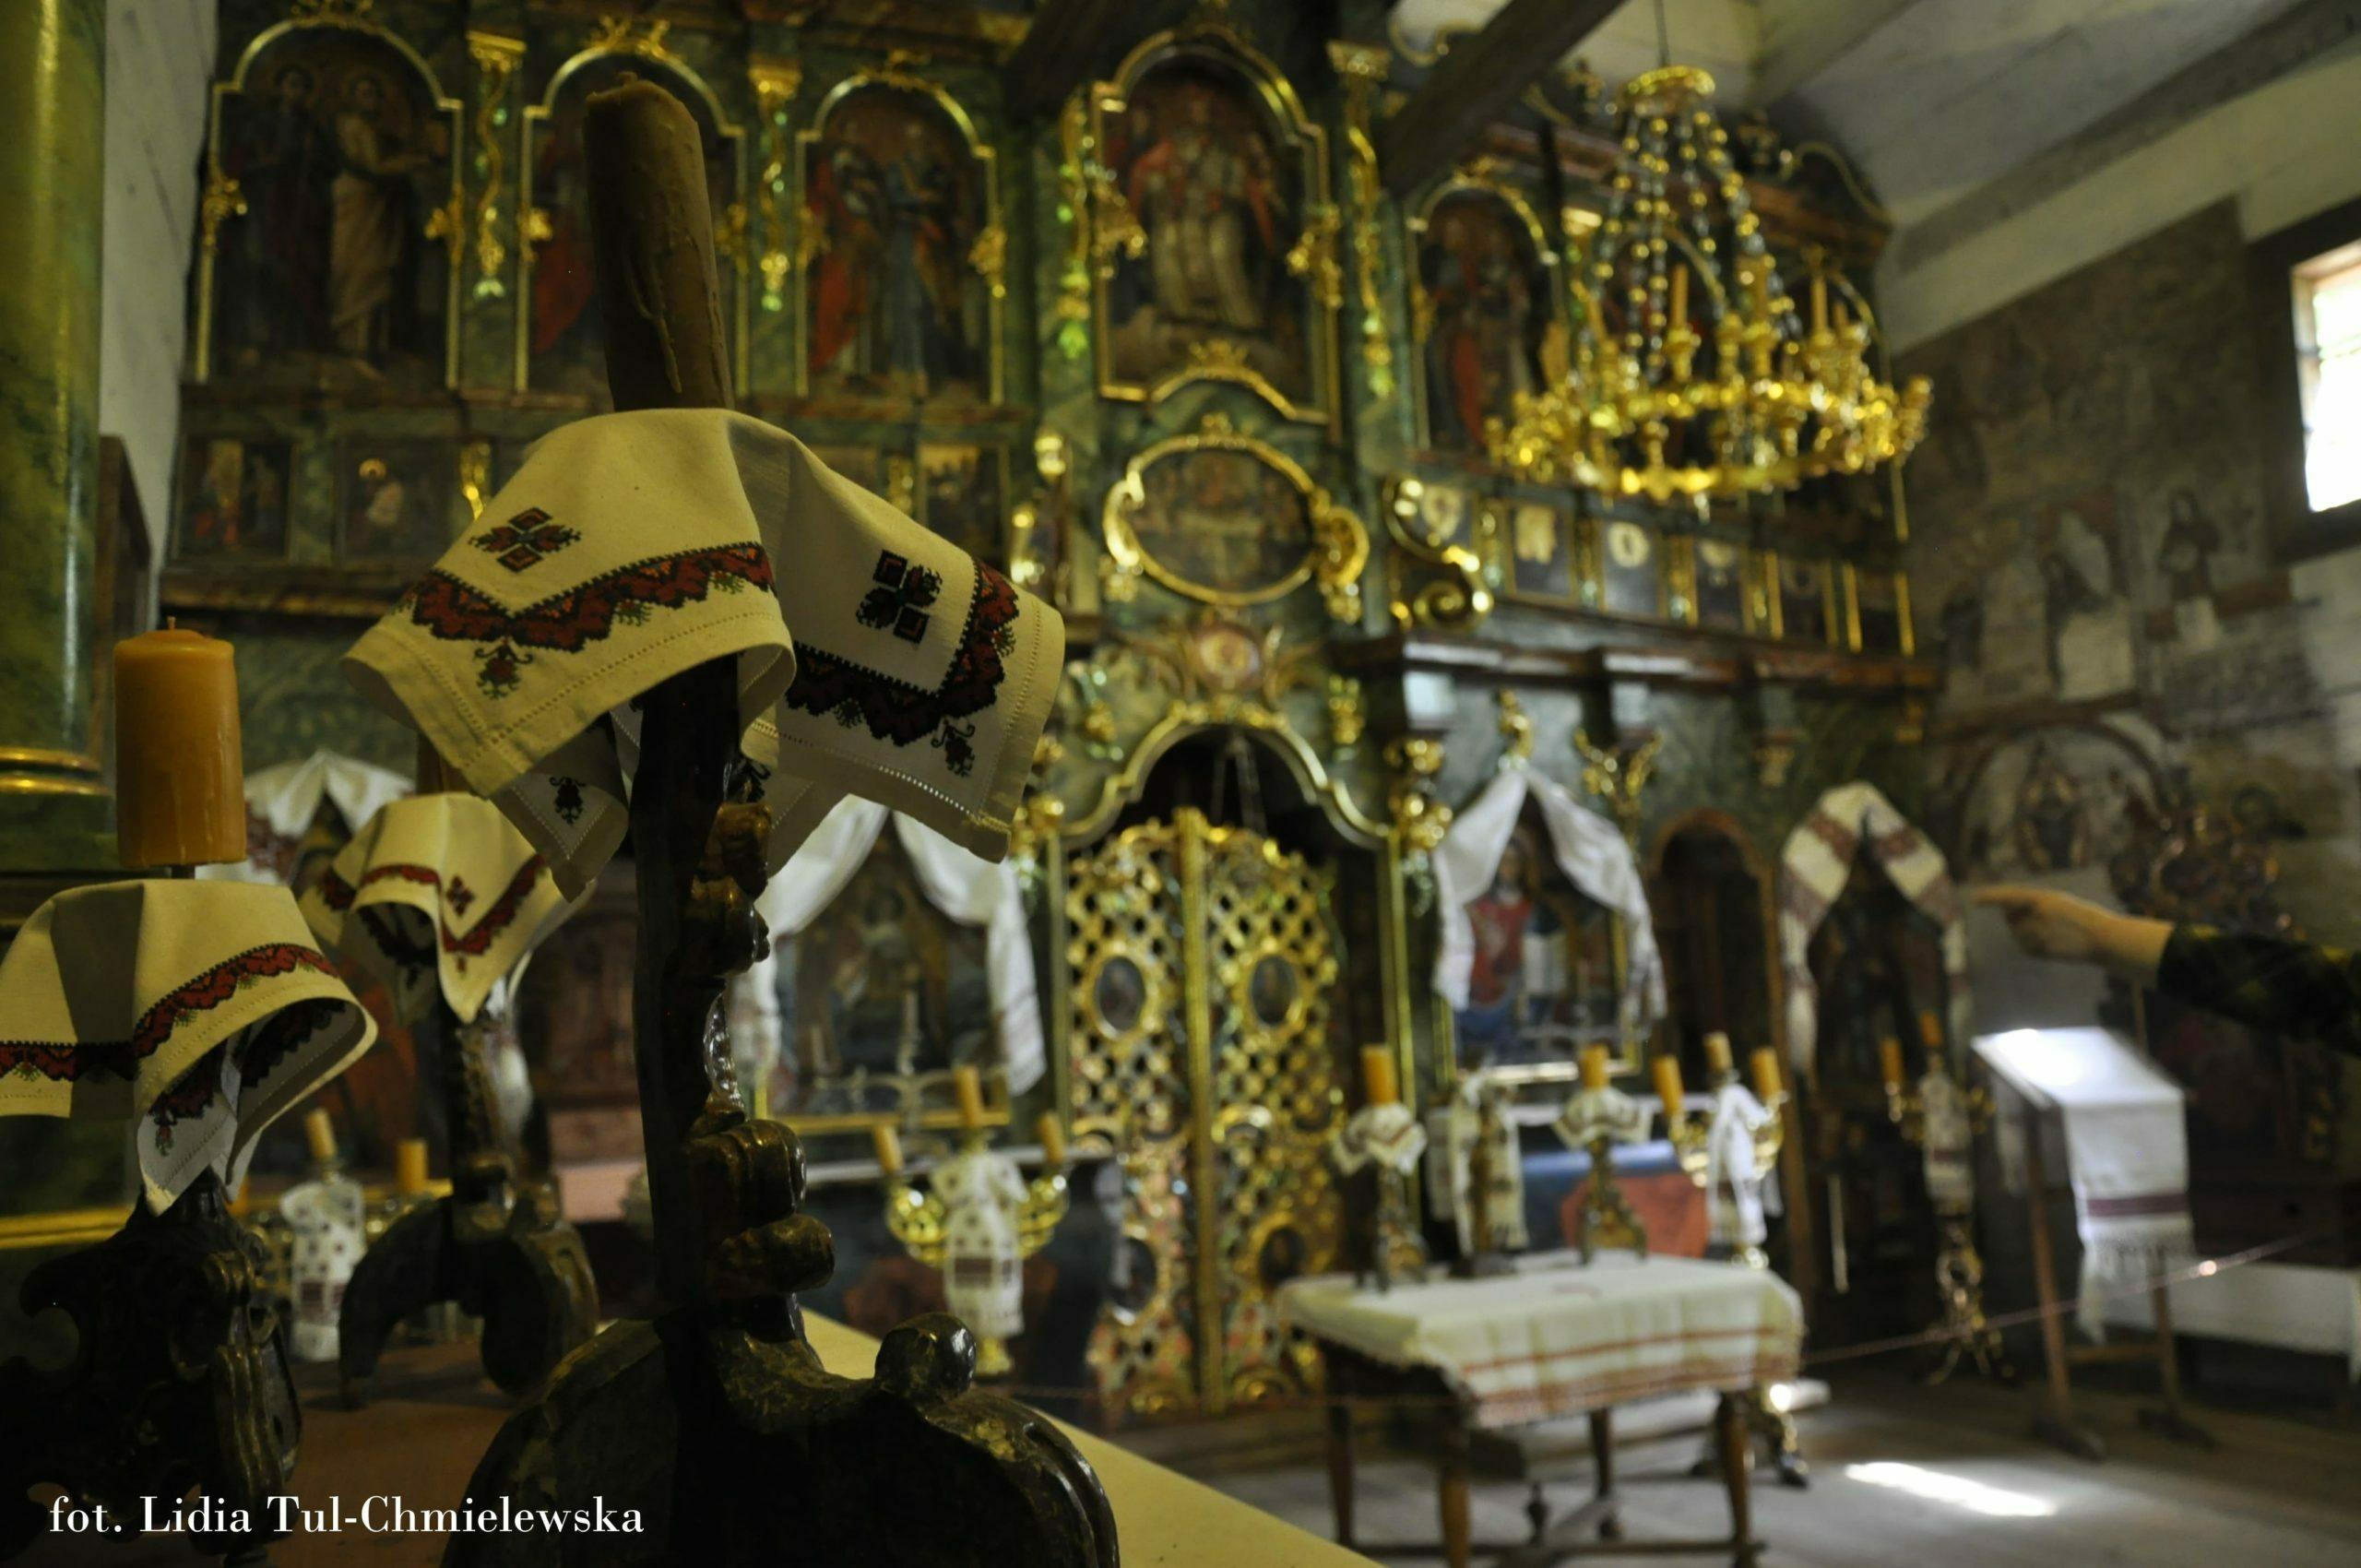 Cerkiew i ikonostas fot. Lidia Tul-Chmielewska